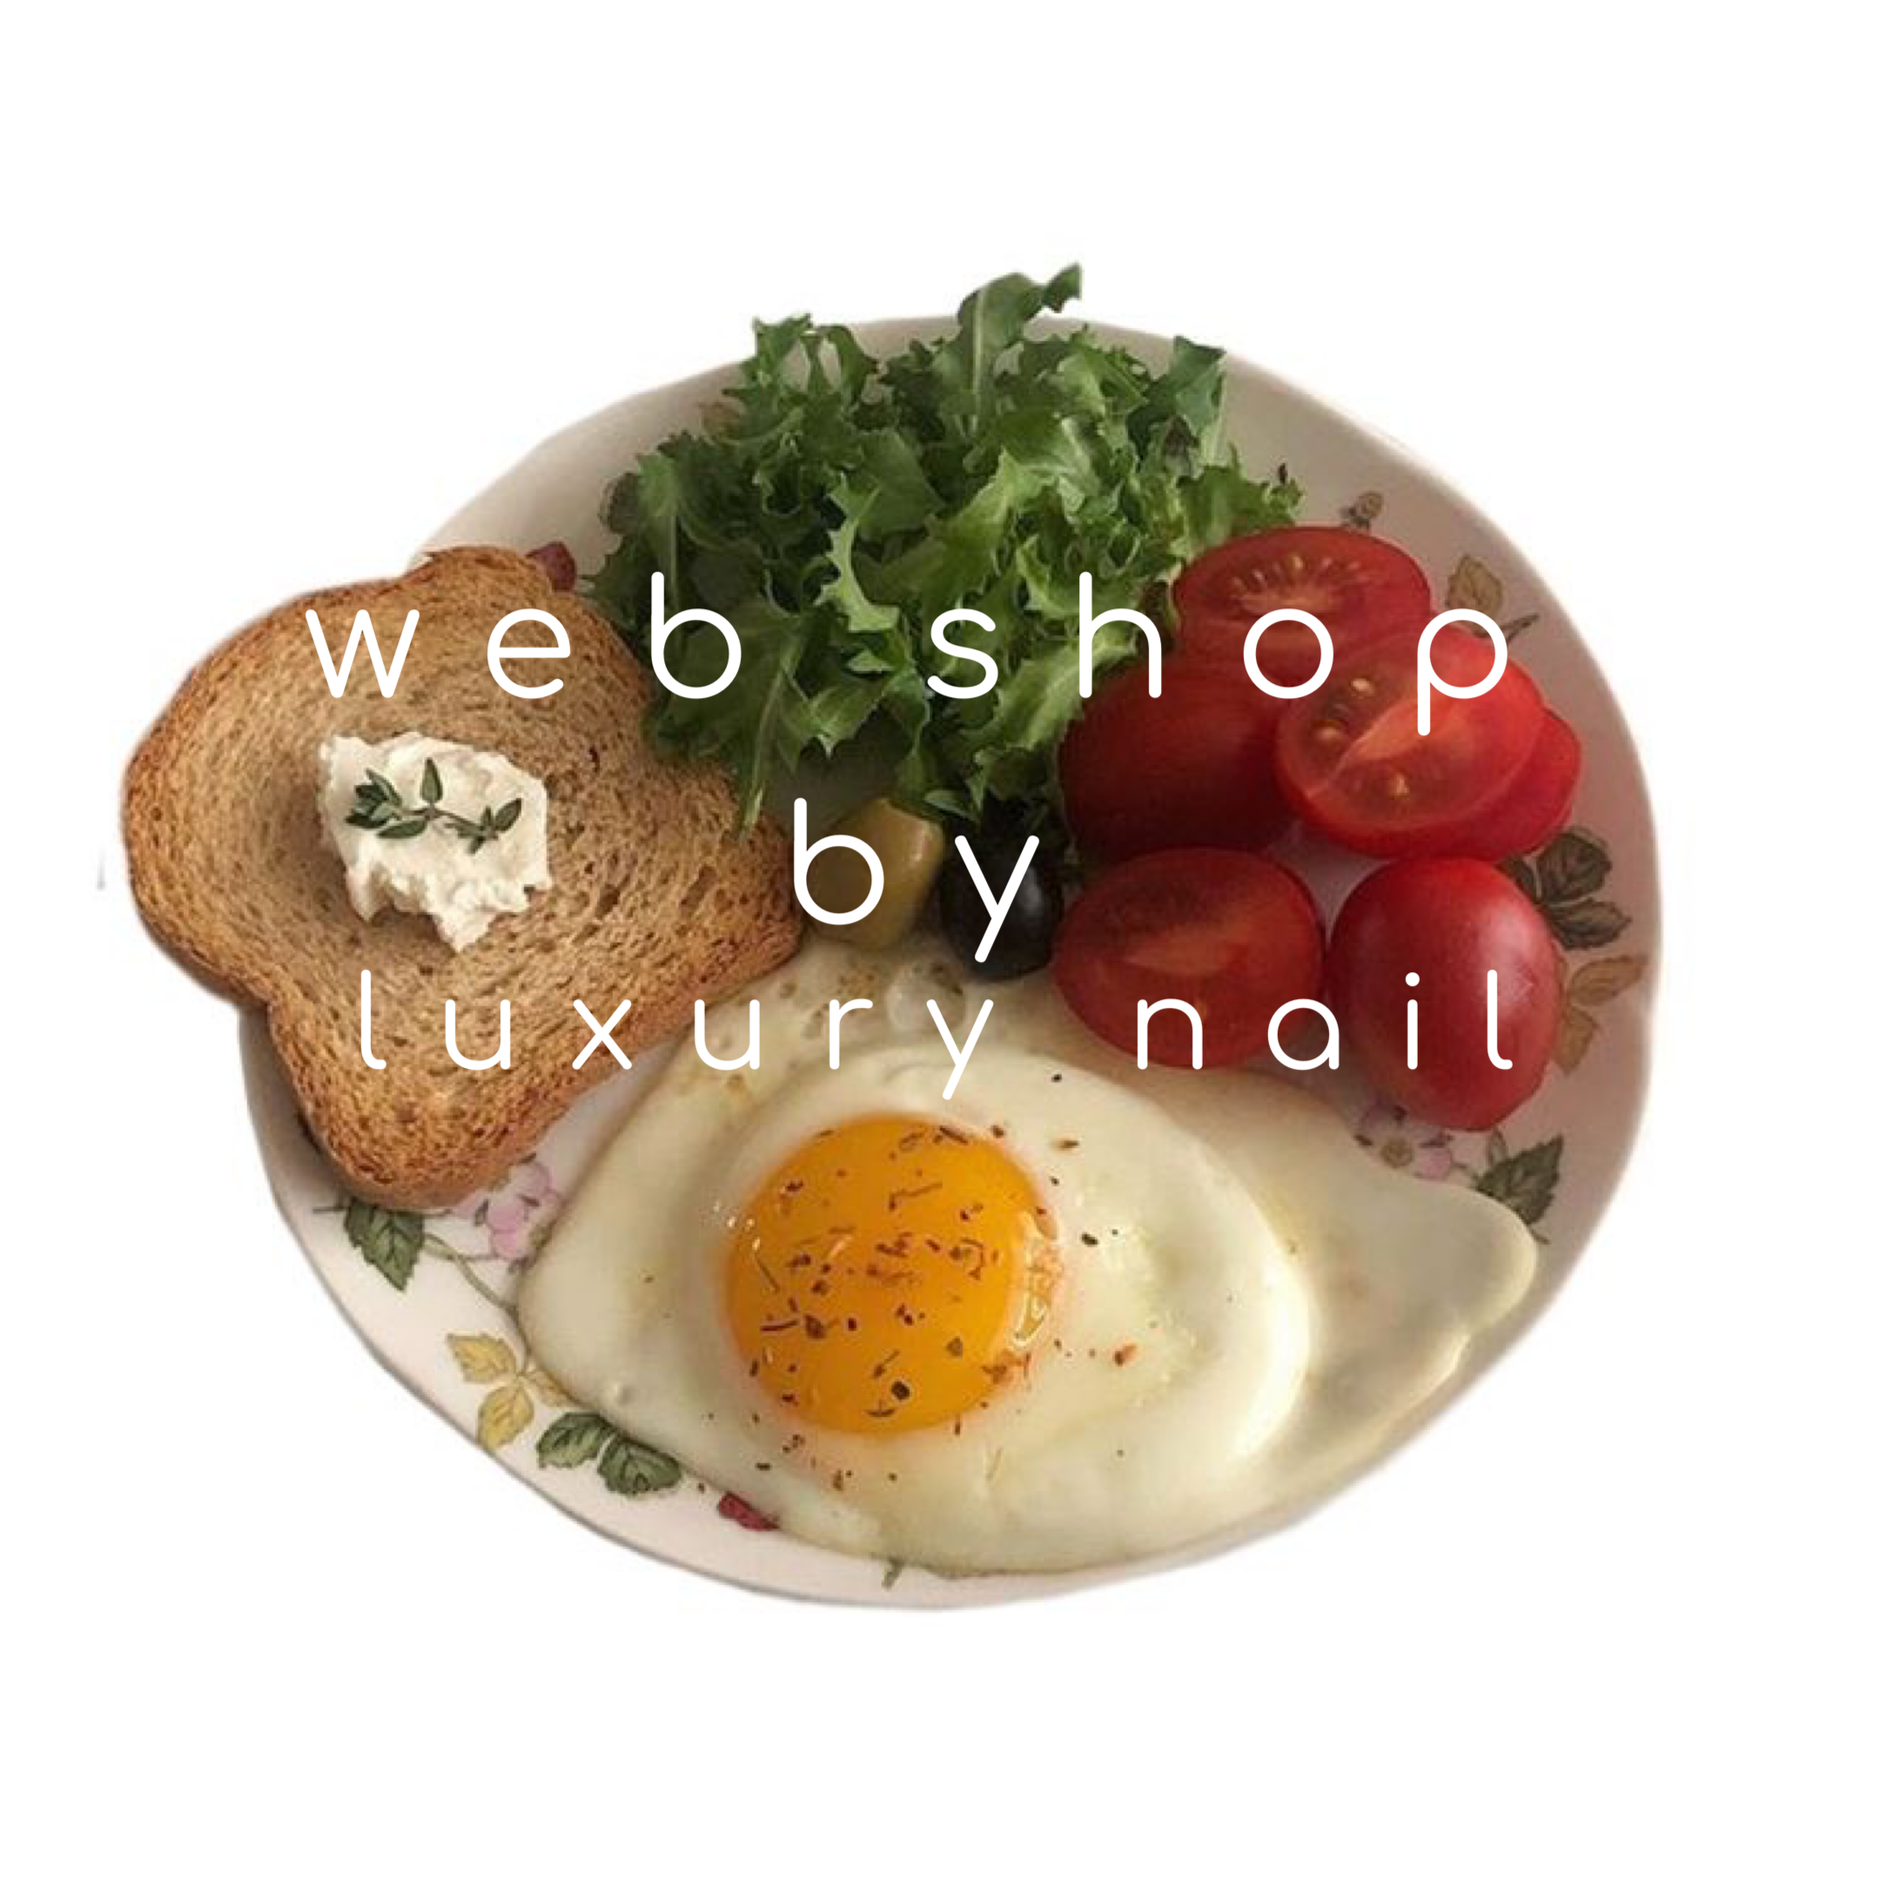 web shop by luxury nail atelier